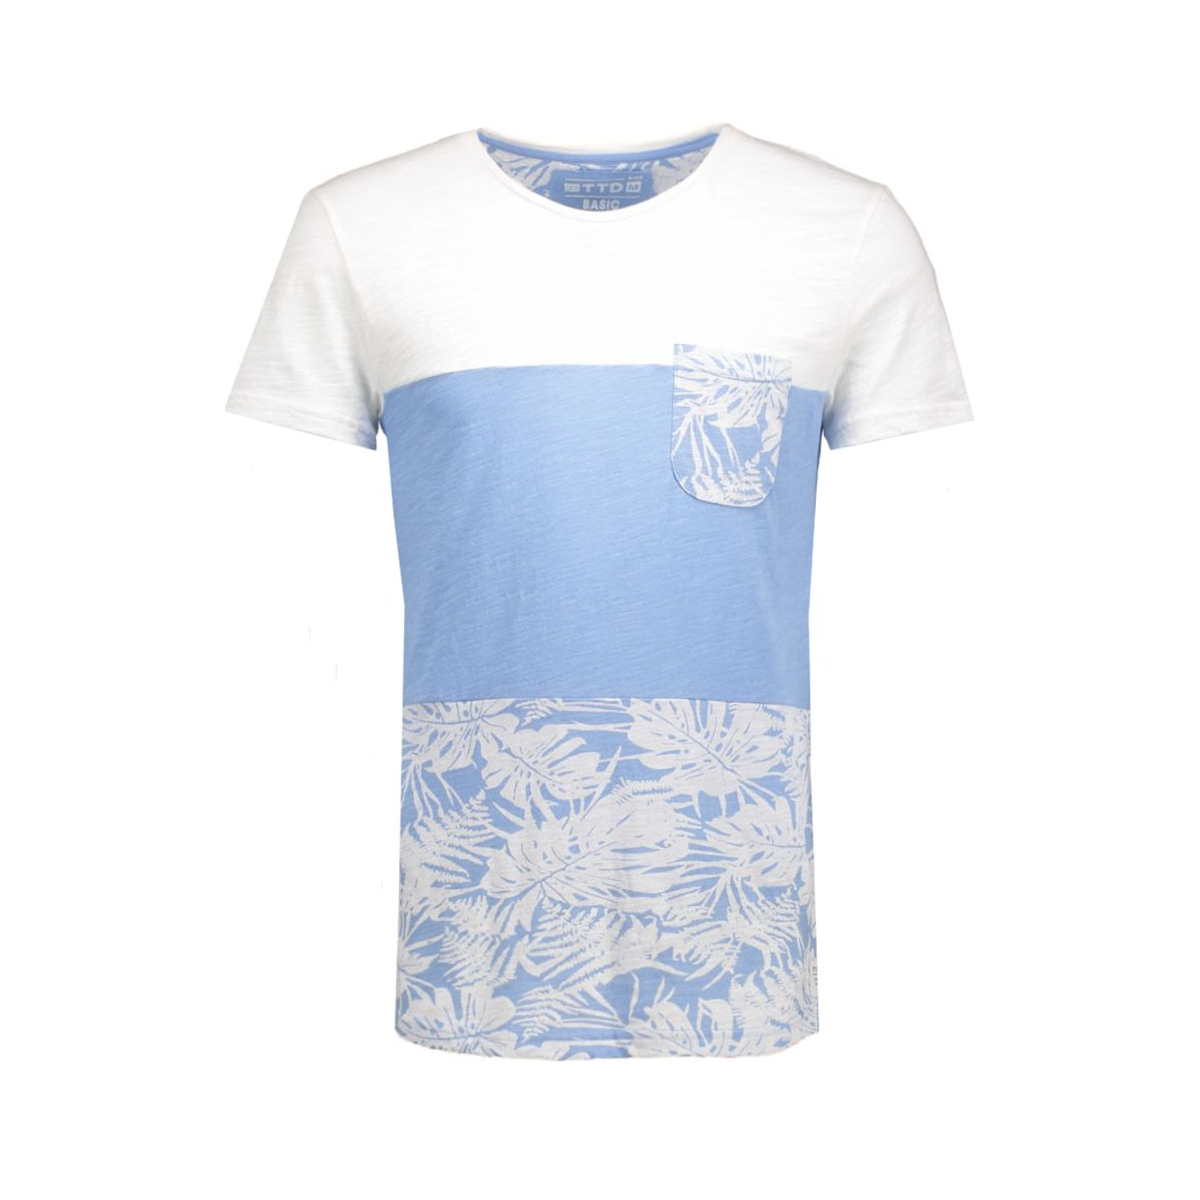 1035300.62.12 tom tailor t-shirt 6692